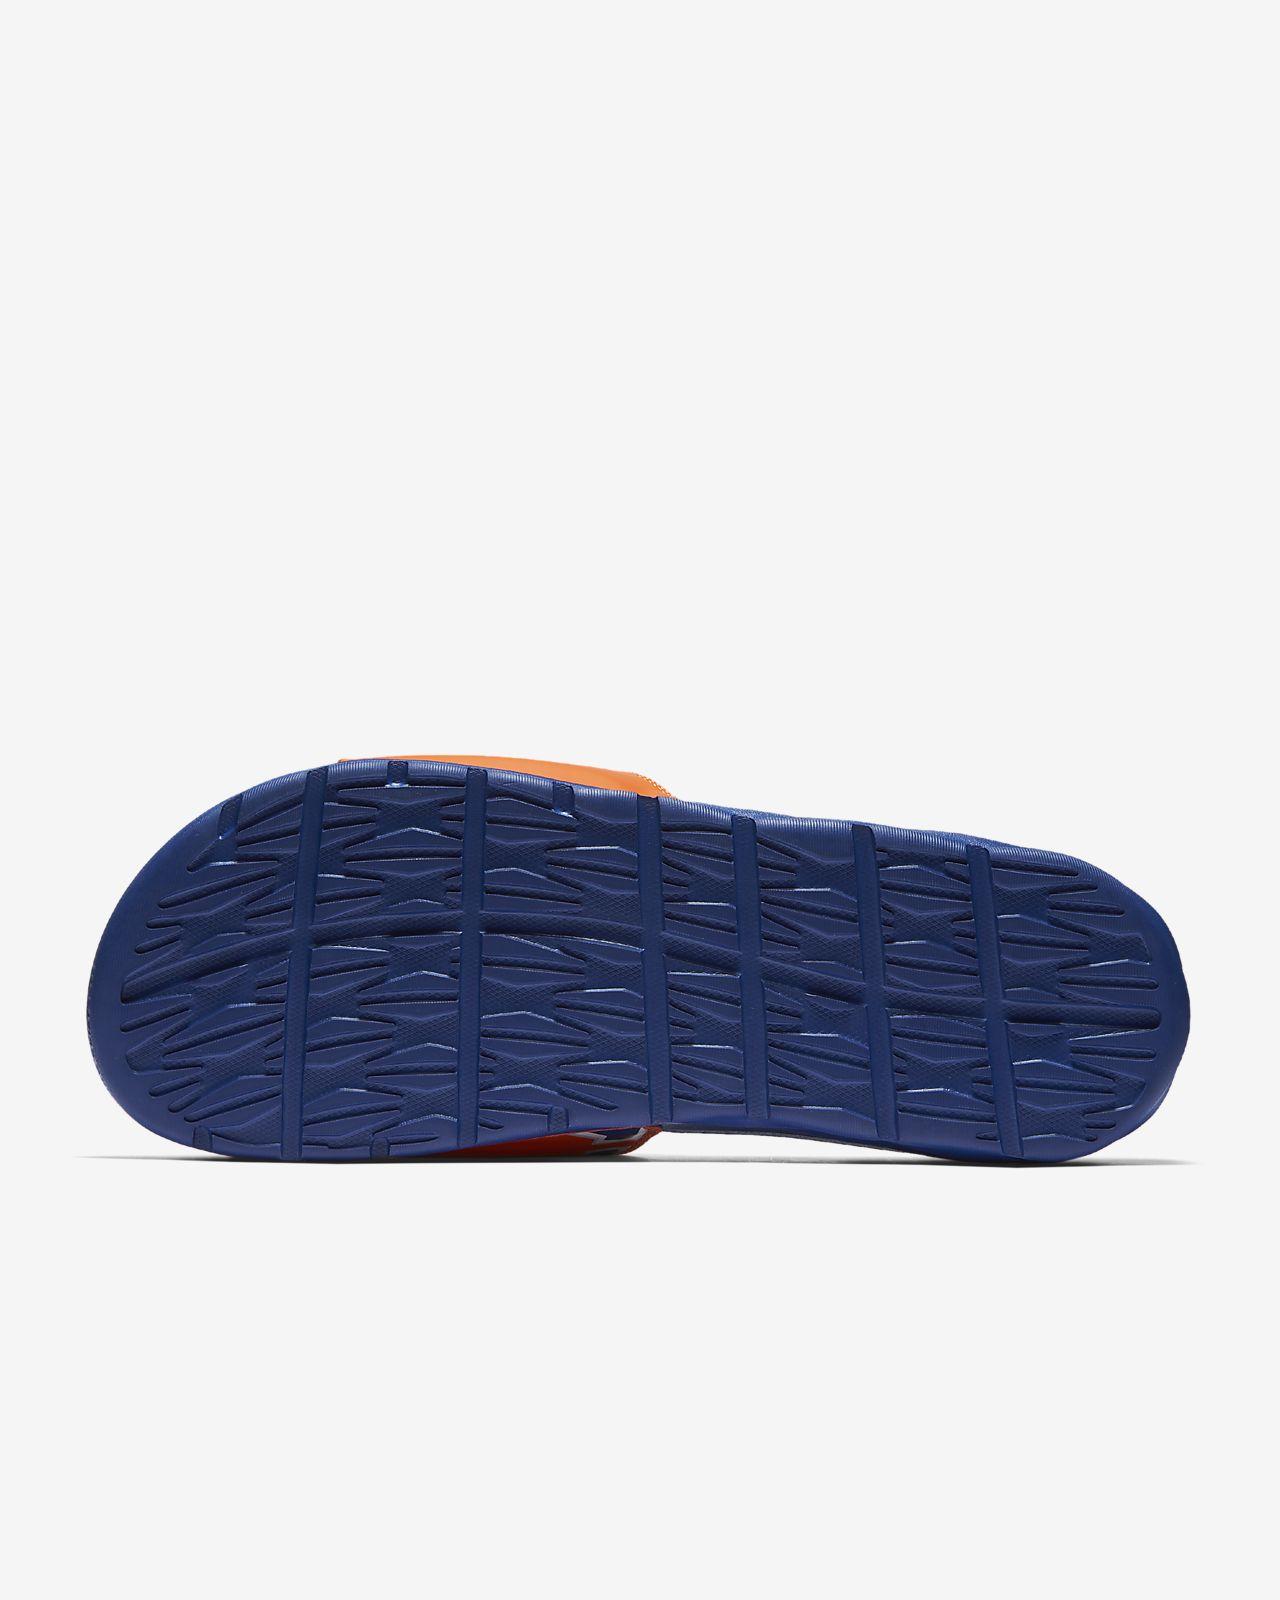 6a4bde40a2b4 Nike Benassi NBA Men s Slide. Nike.com